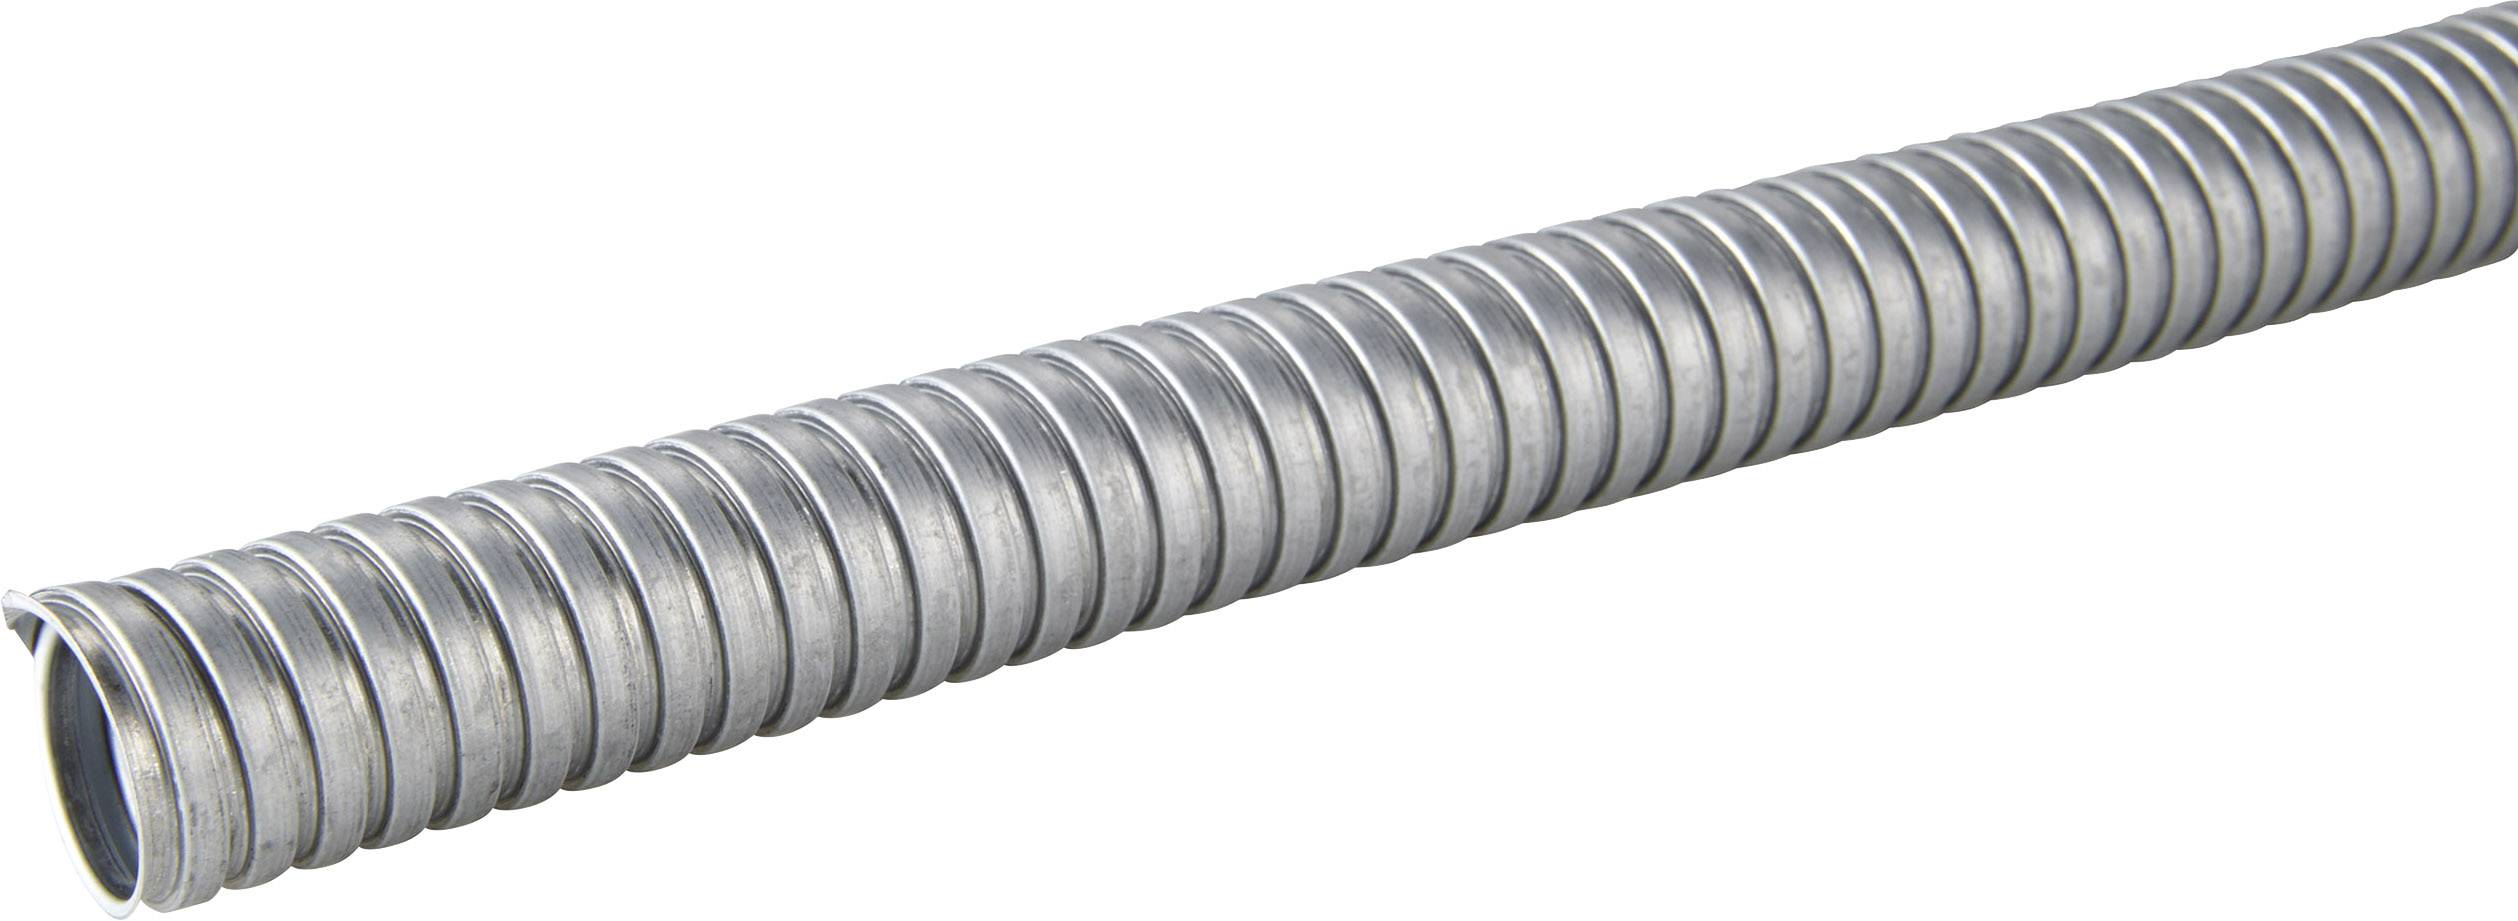 Ochranná hadice na kov LappKabel SILVYN® AS 48/51x56 61802170, stříbrná, 25 m